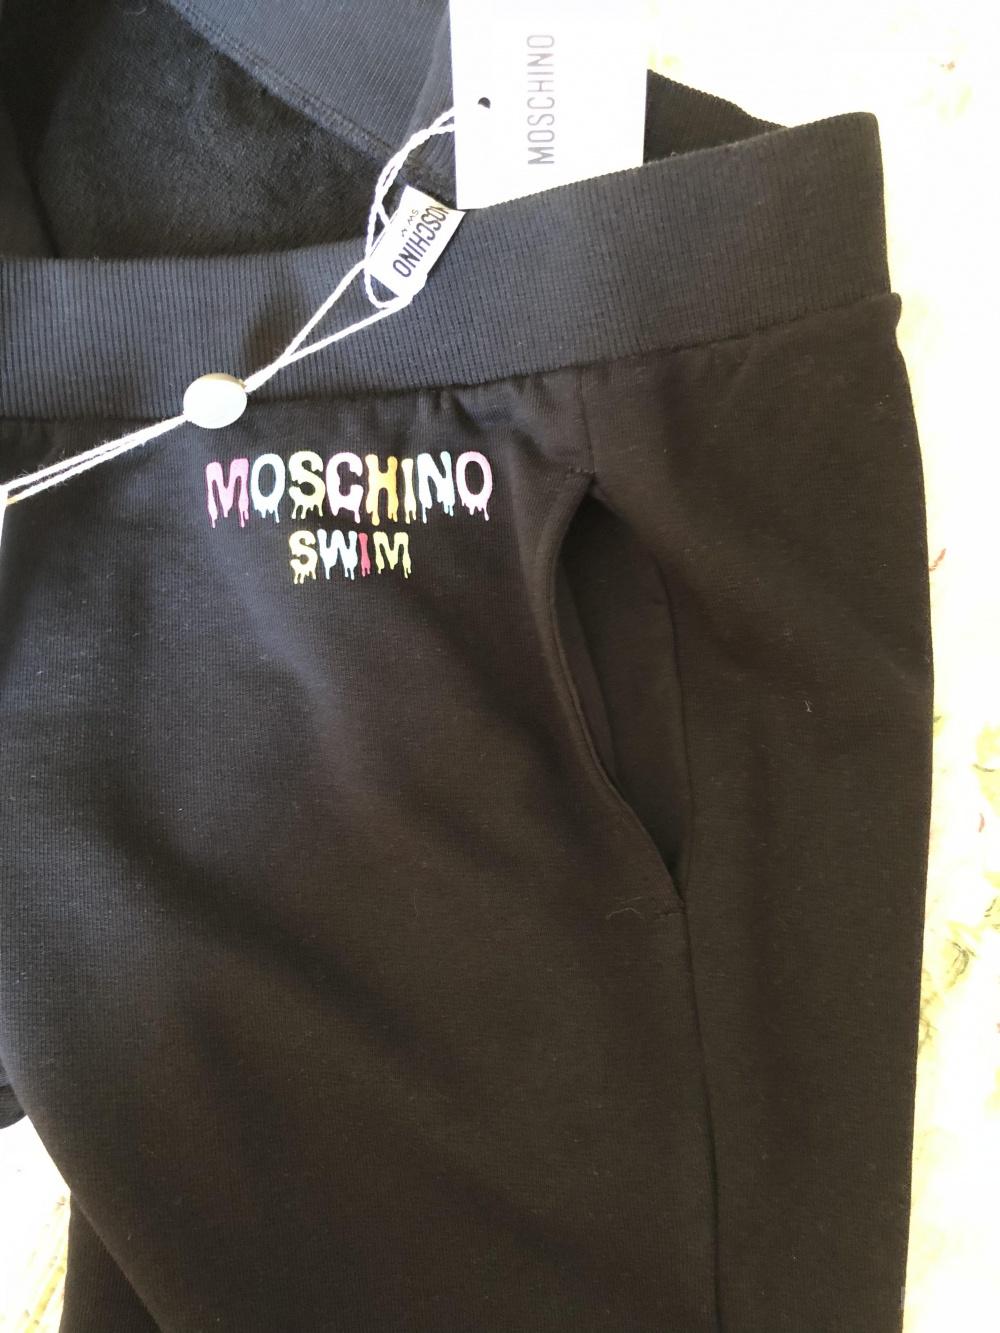 Спортивные брюки MOSCHINO, р-р М